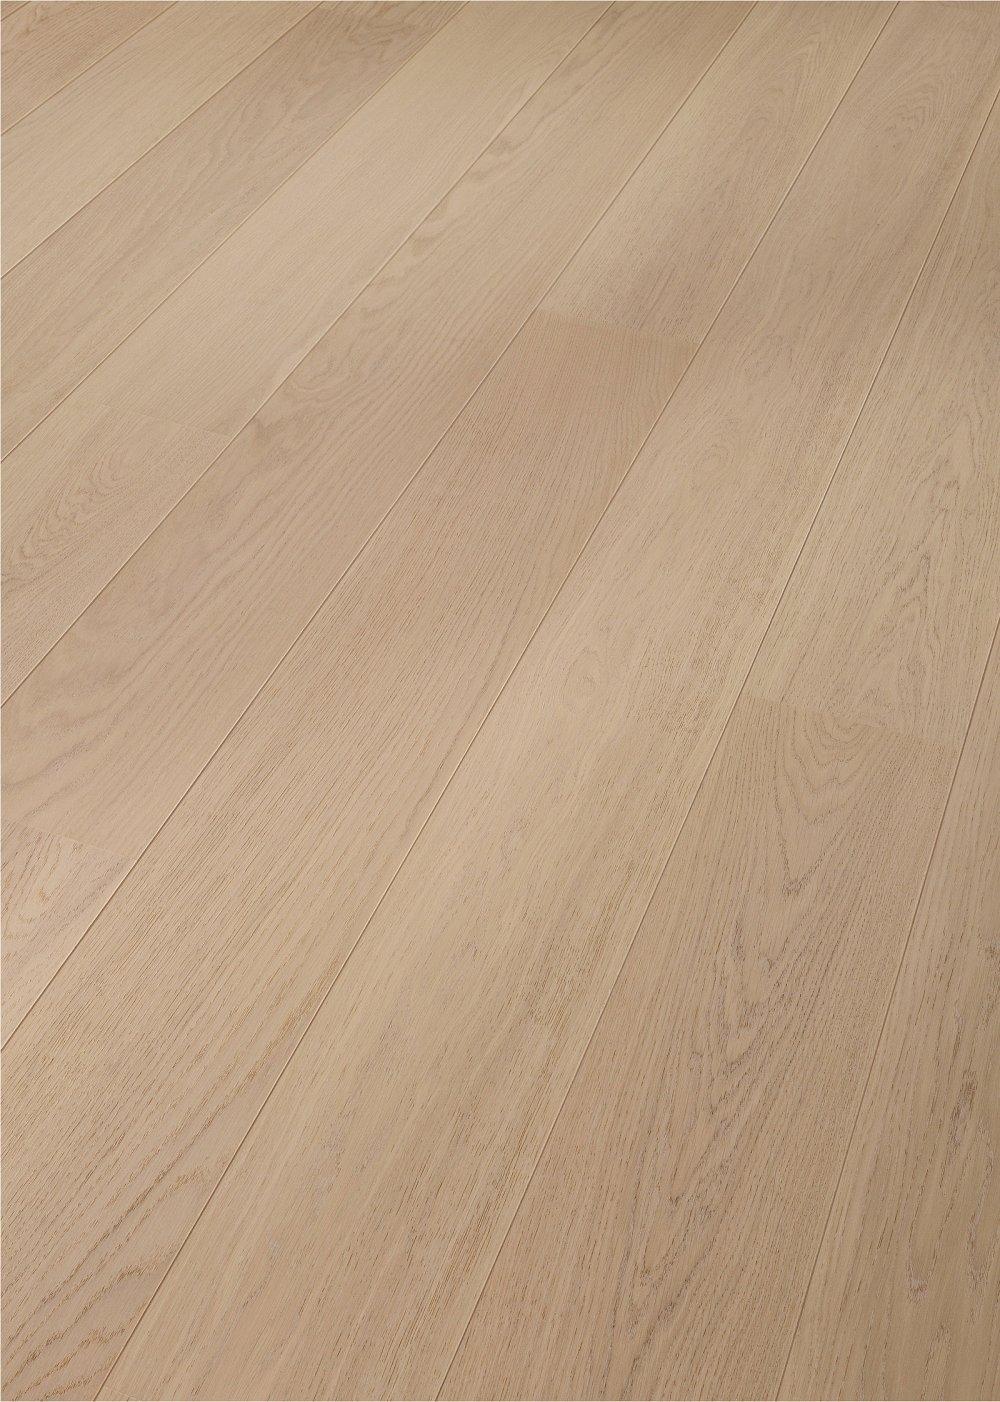 8090 meister longlife parkett pd 400 cottage landhausdiele. Black Bedroom Furniture Sets. Home Design Ideas